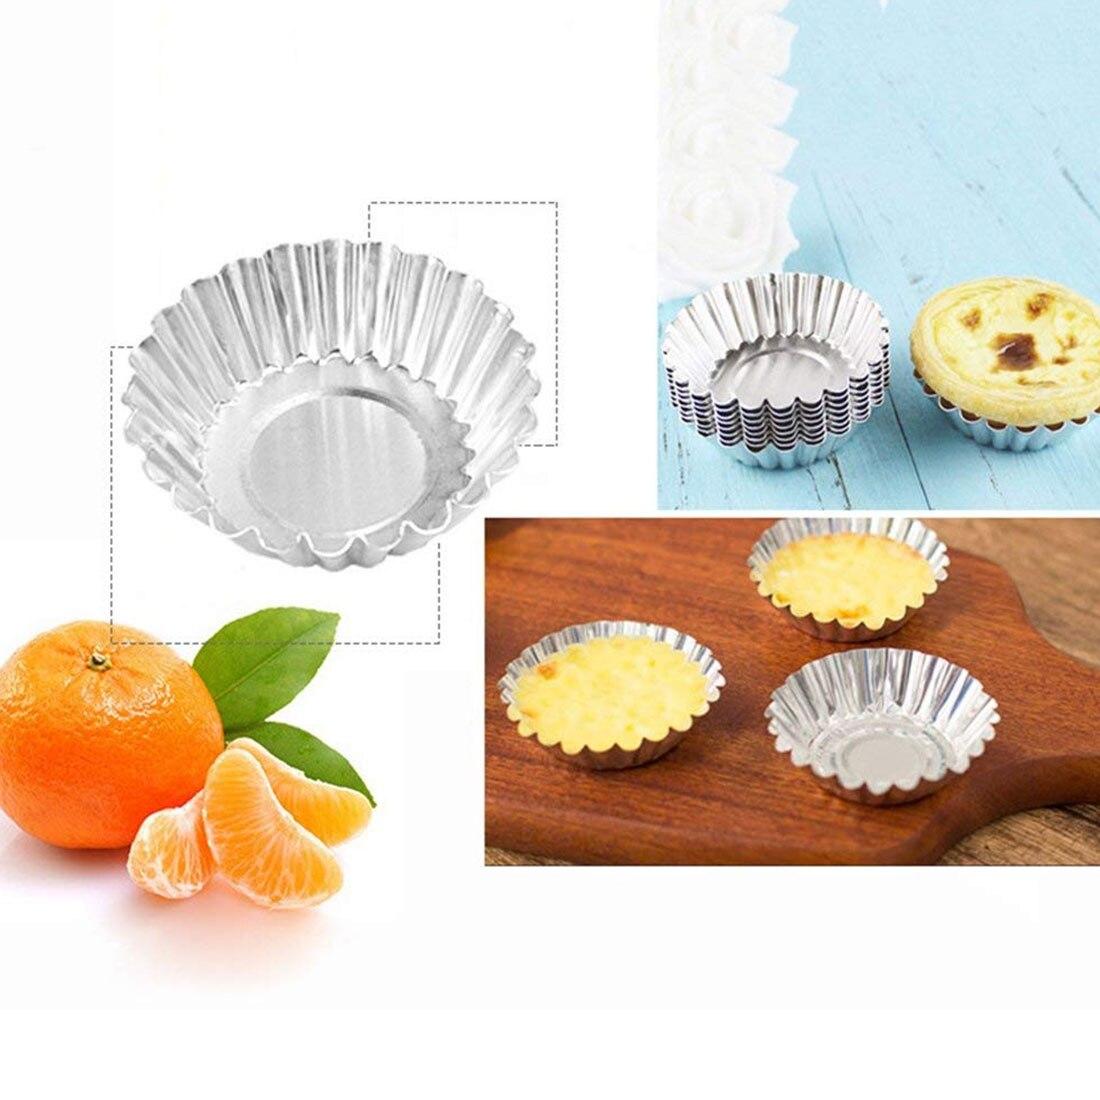 10pcs/lot Egg Tart Mold Cake Aluminium Alloy Mould Baking Tool Cupcake Fruit 70mm Diameter